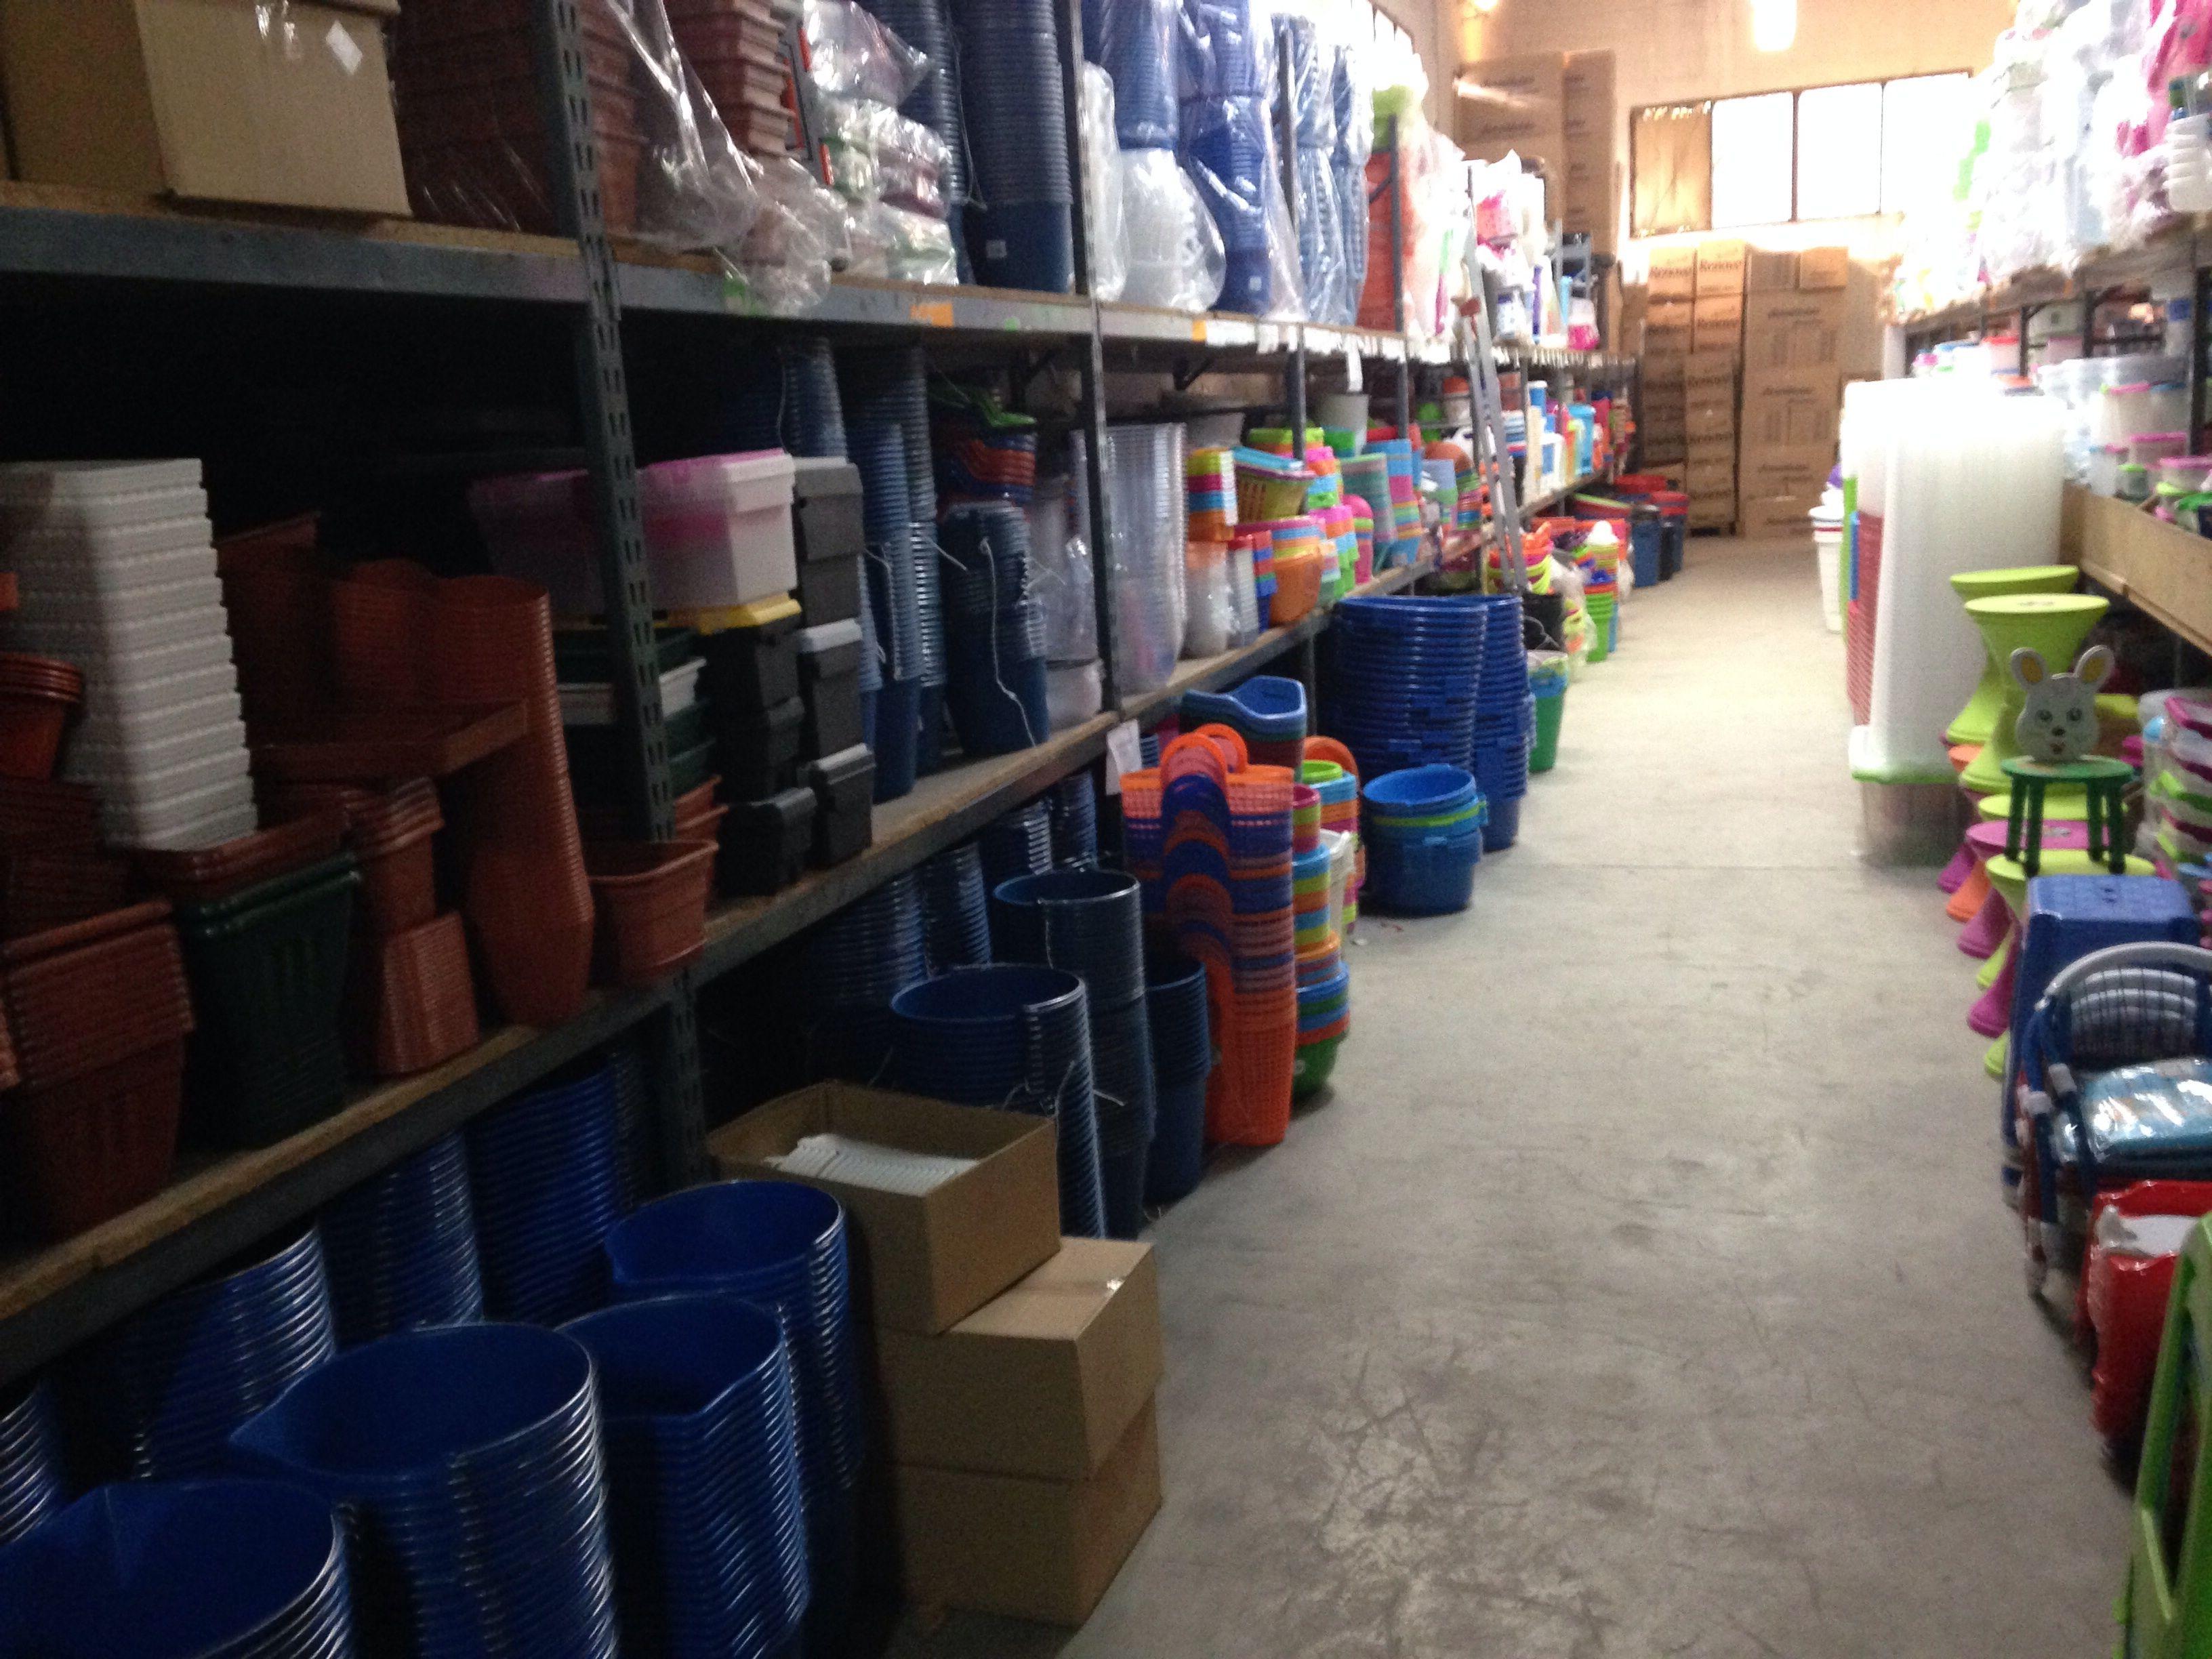 Cubos, barreńos, cestos, capazo ect